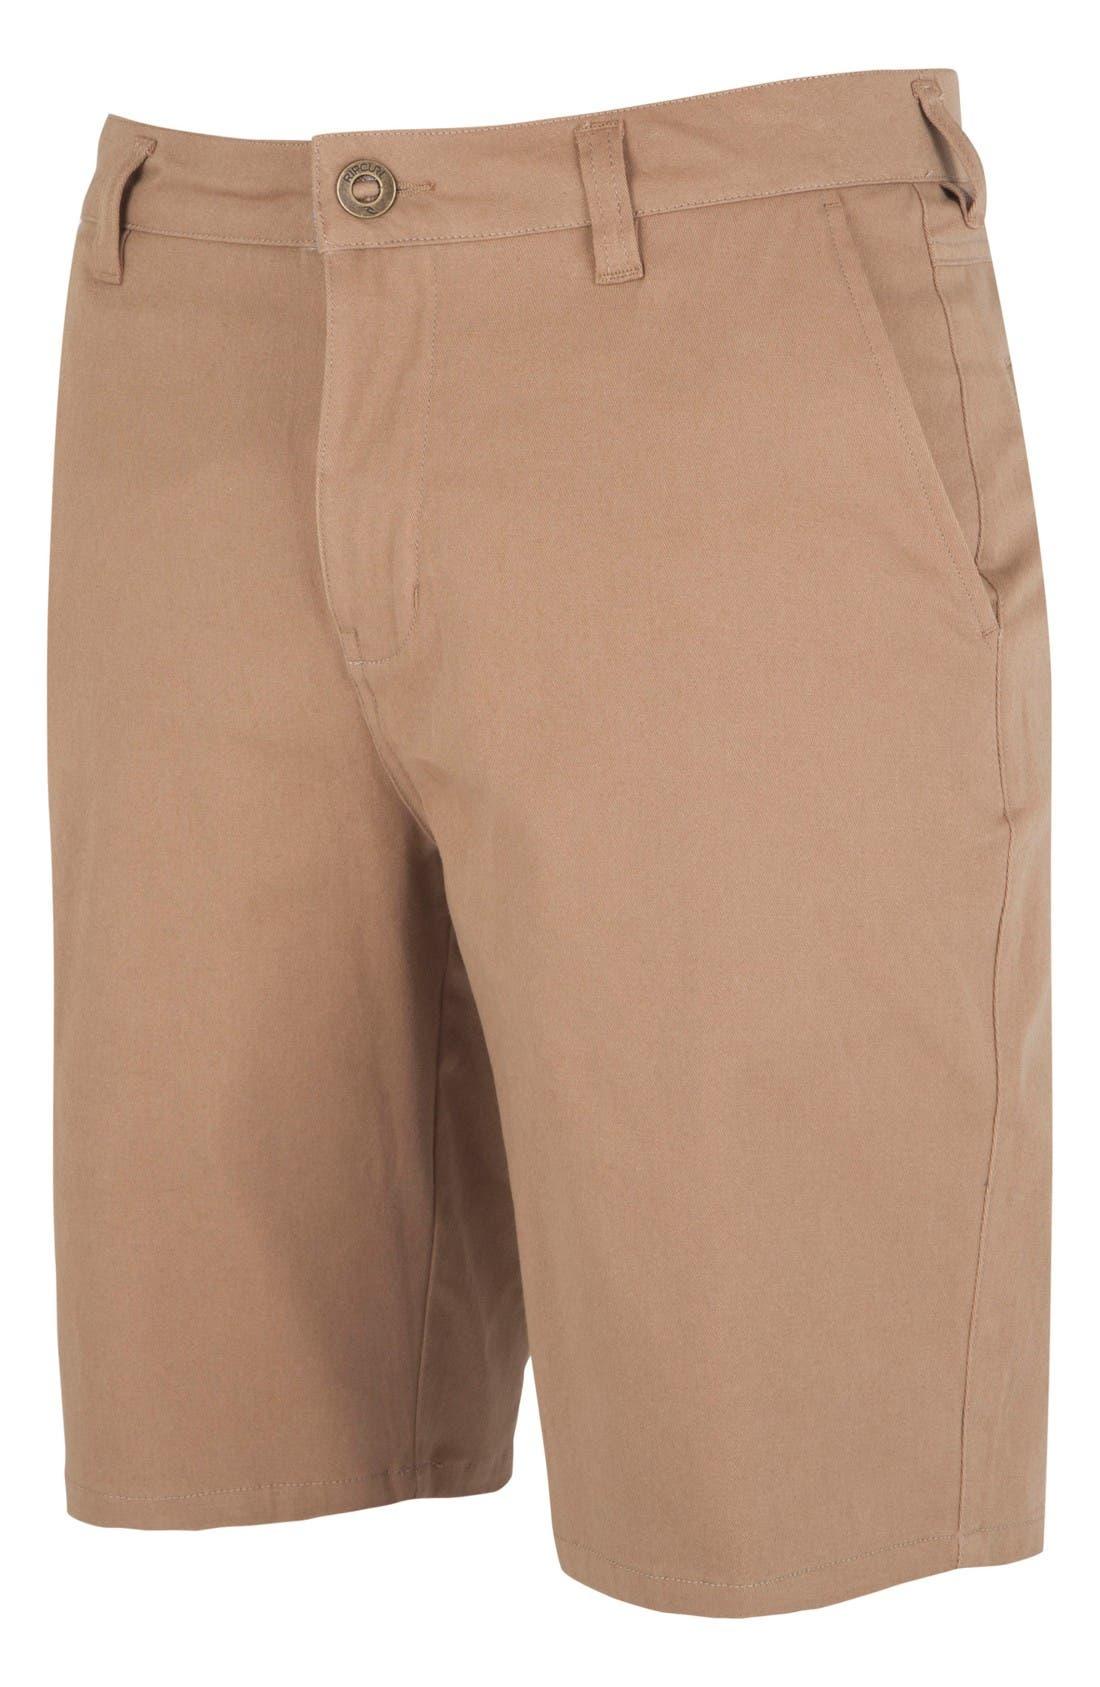 RIP CURL Epic Stretch Chino Shorts